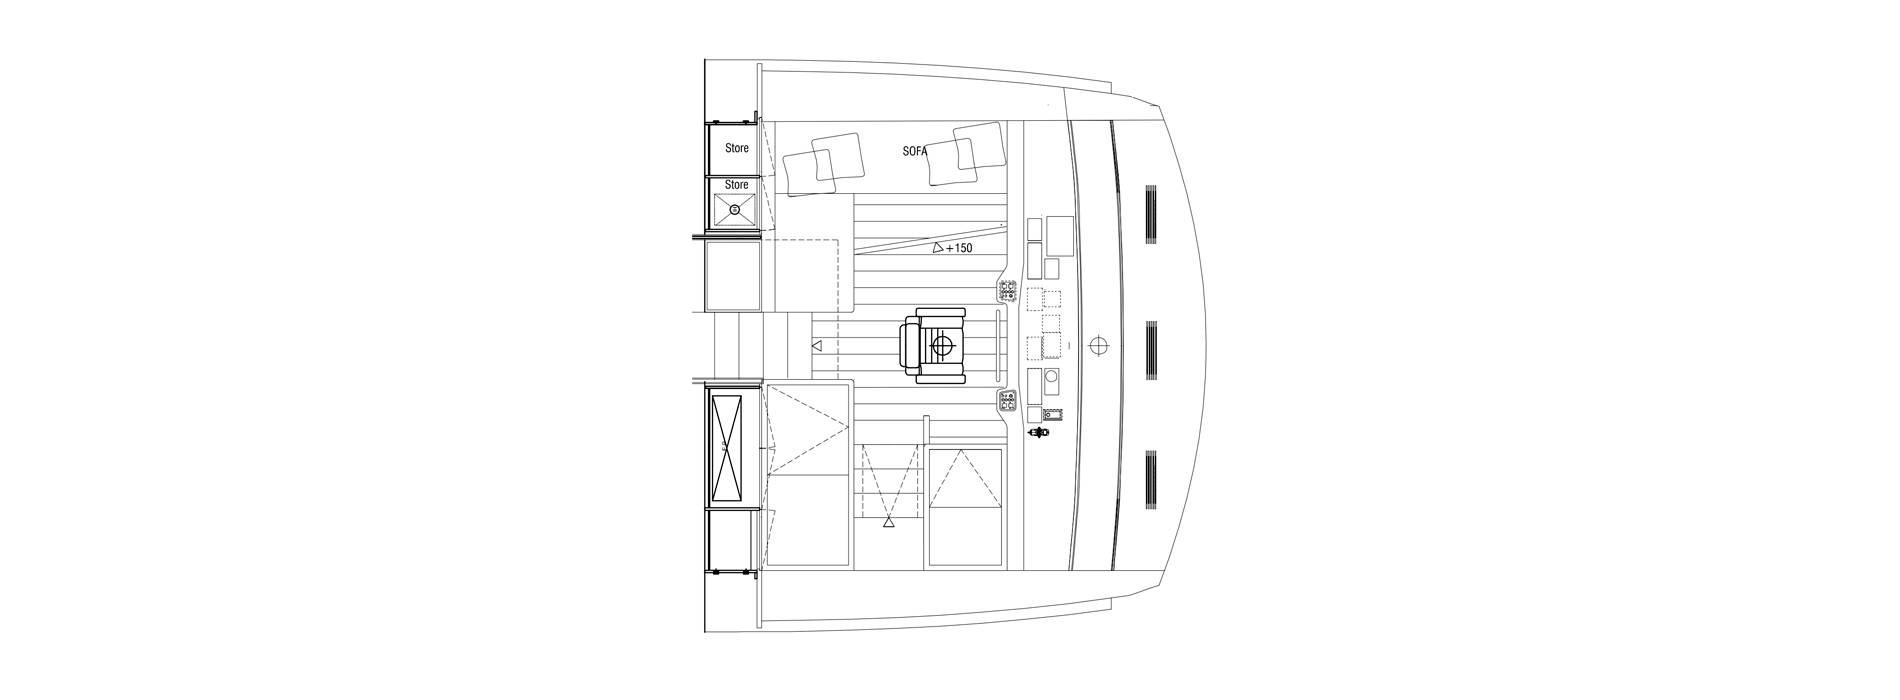 Sanlorenzo Yachts SL96-635 Detalles